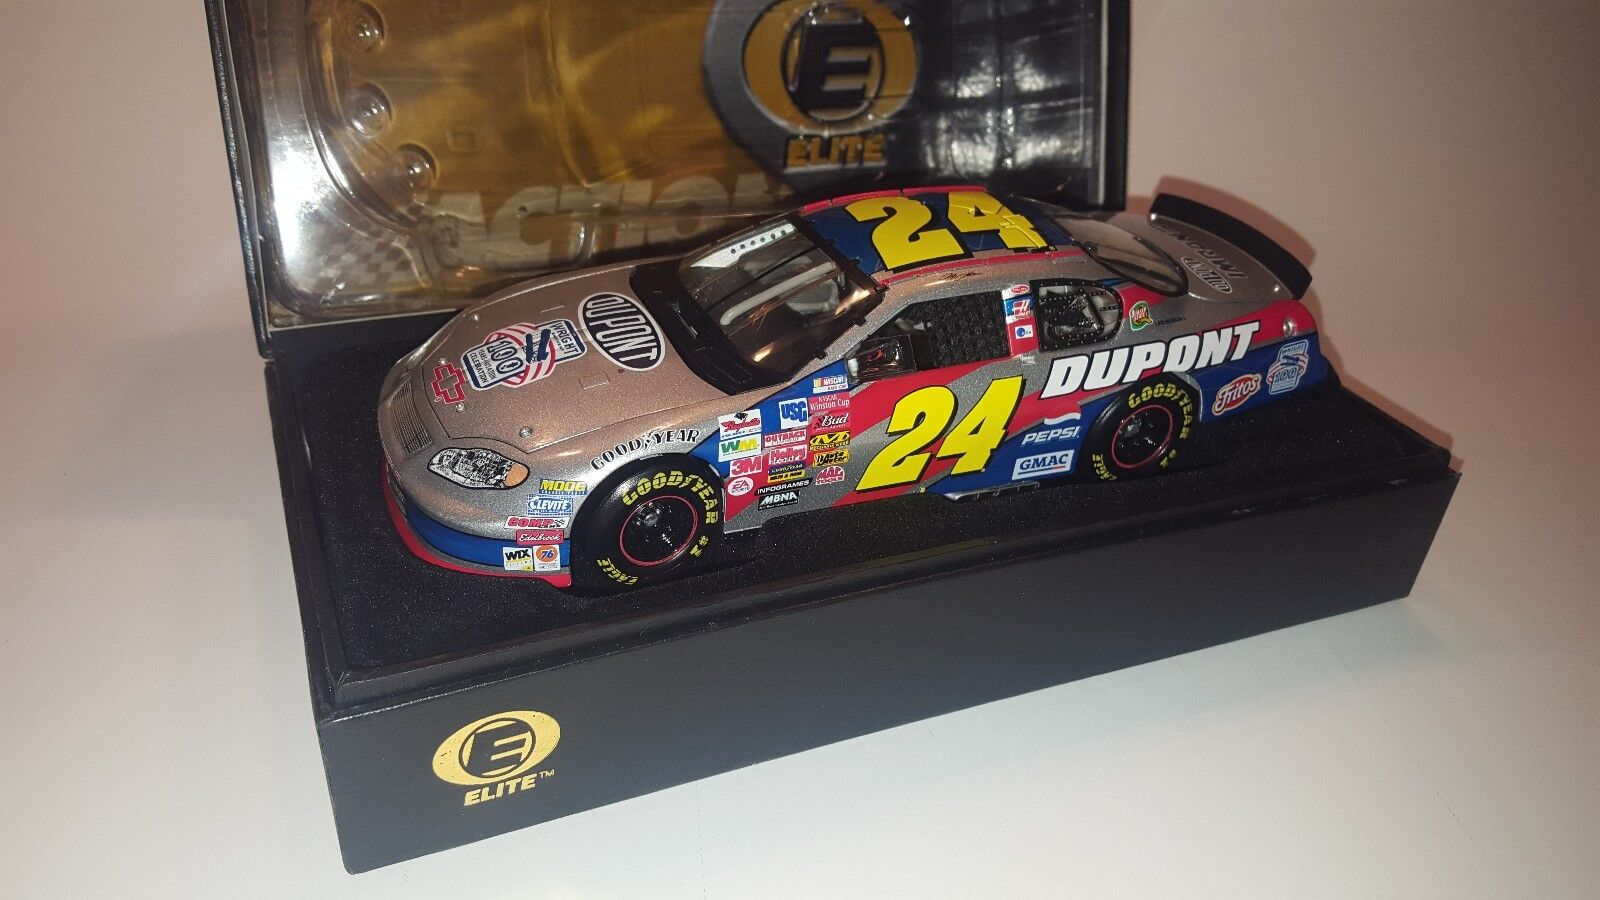 ELITE NIB NASCAR Diecast 1 24 scale collectable car, Jeff Gordon 2003